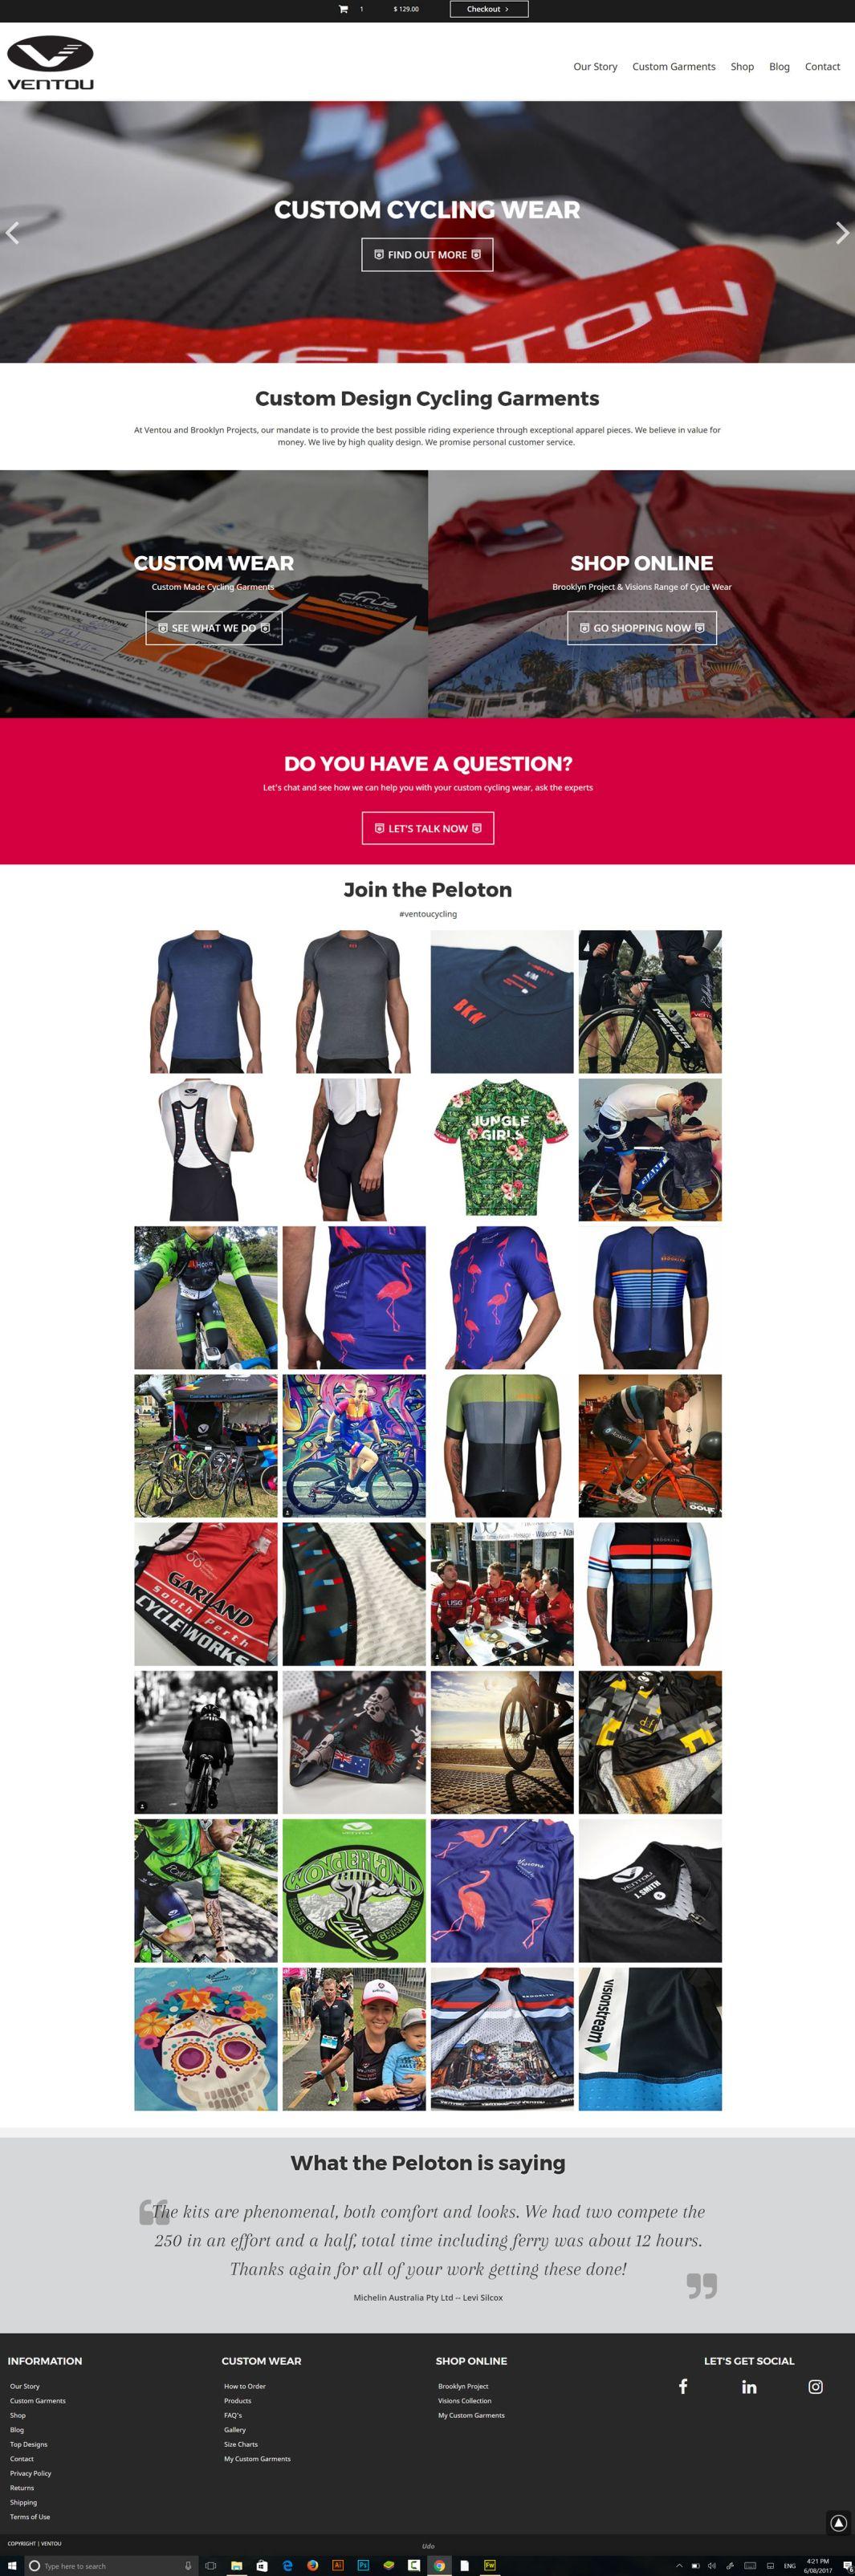 Ventou full page